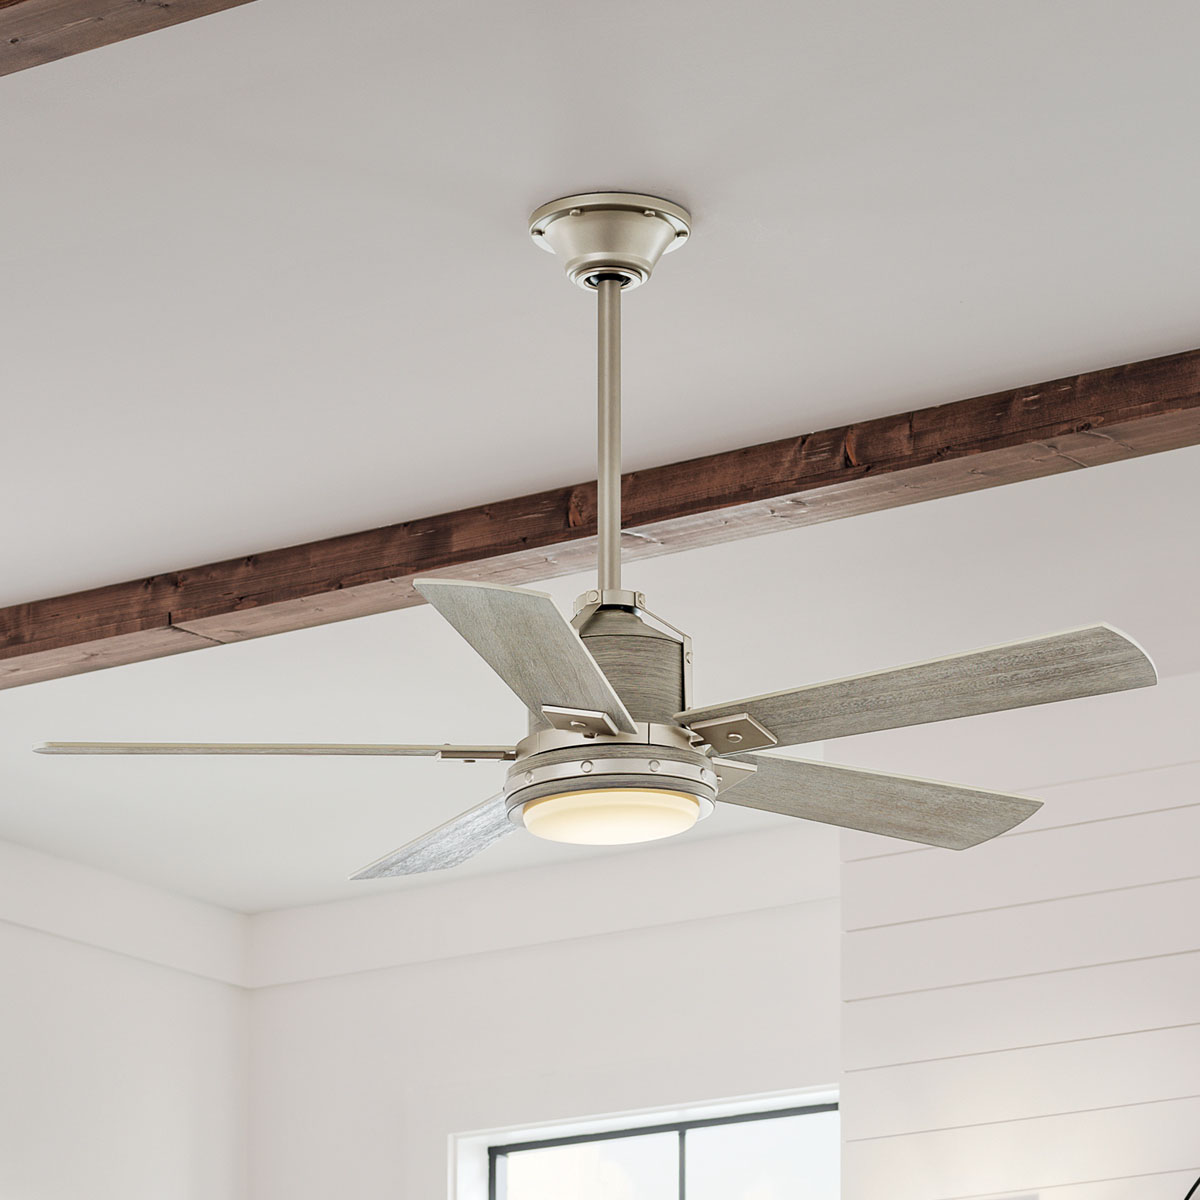 Cleaning A Ceiling Fan Kichler Lighting